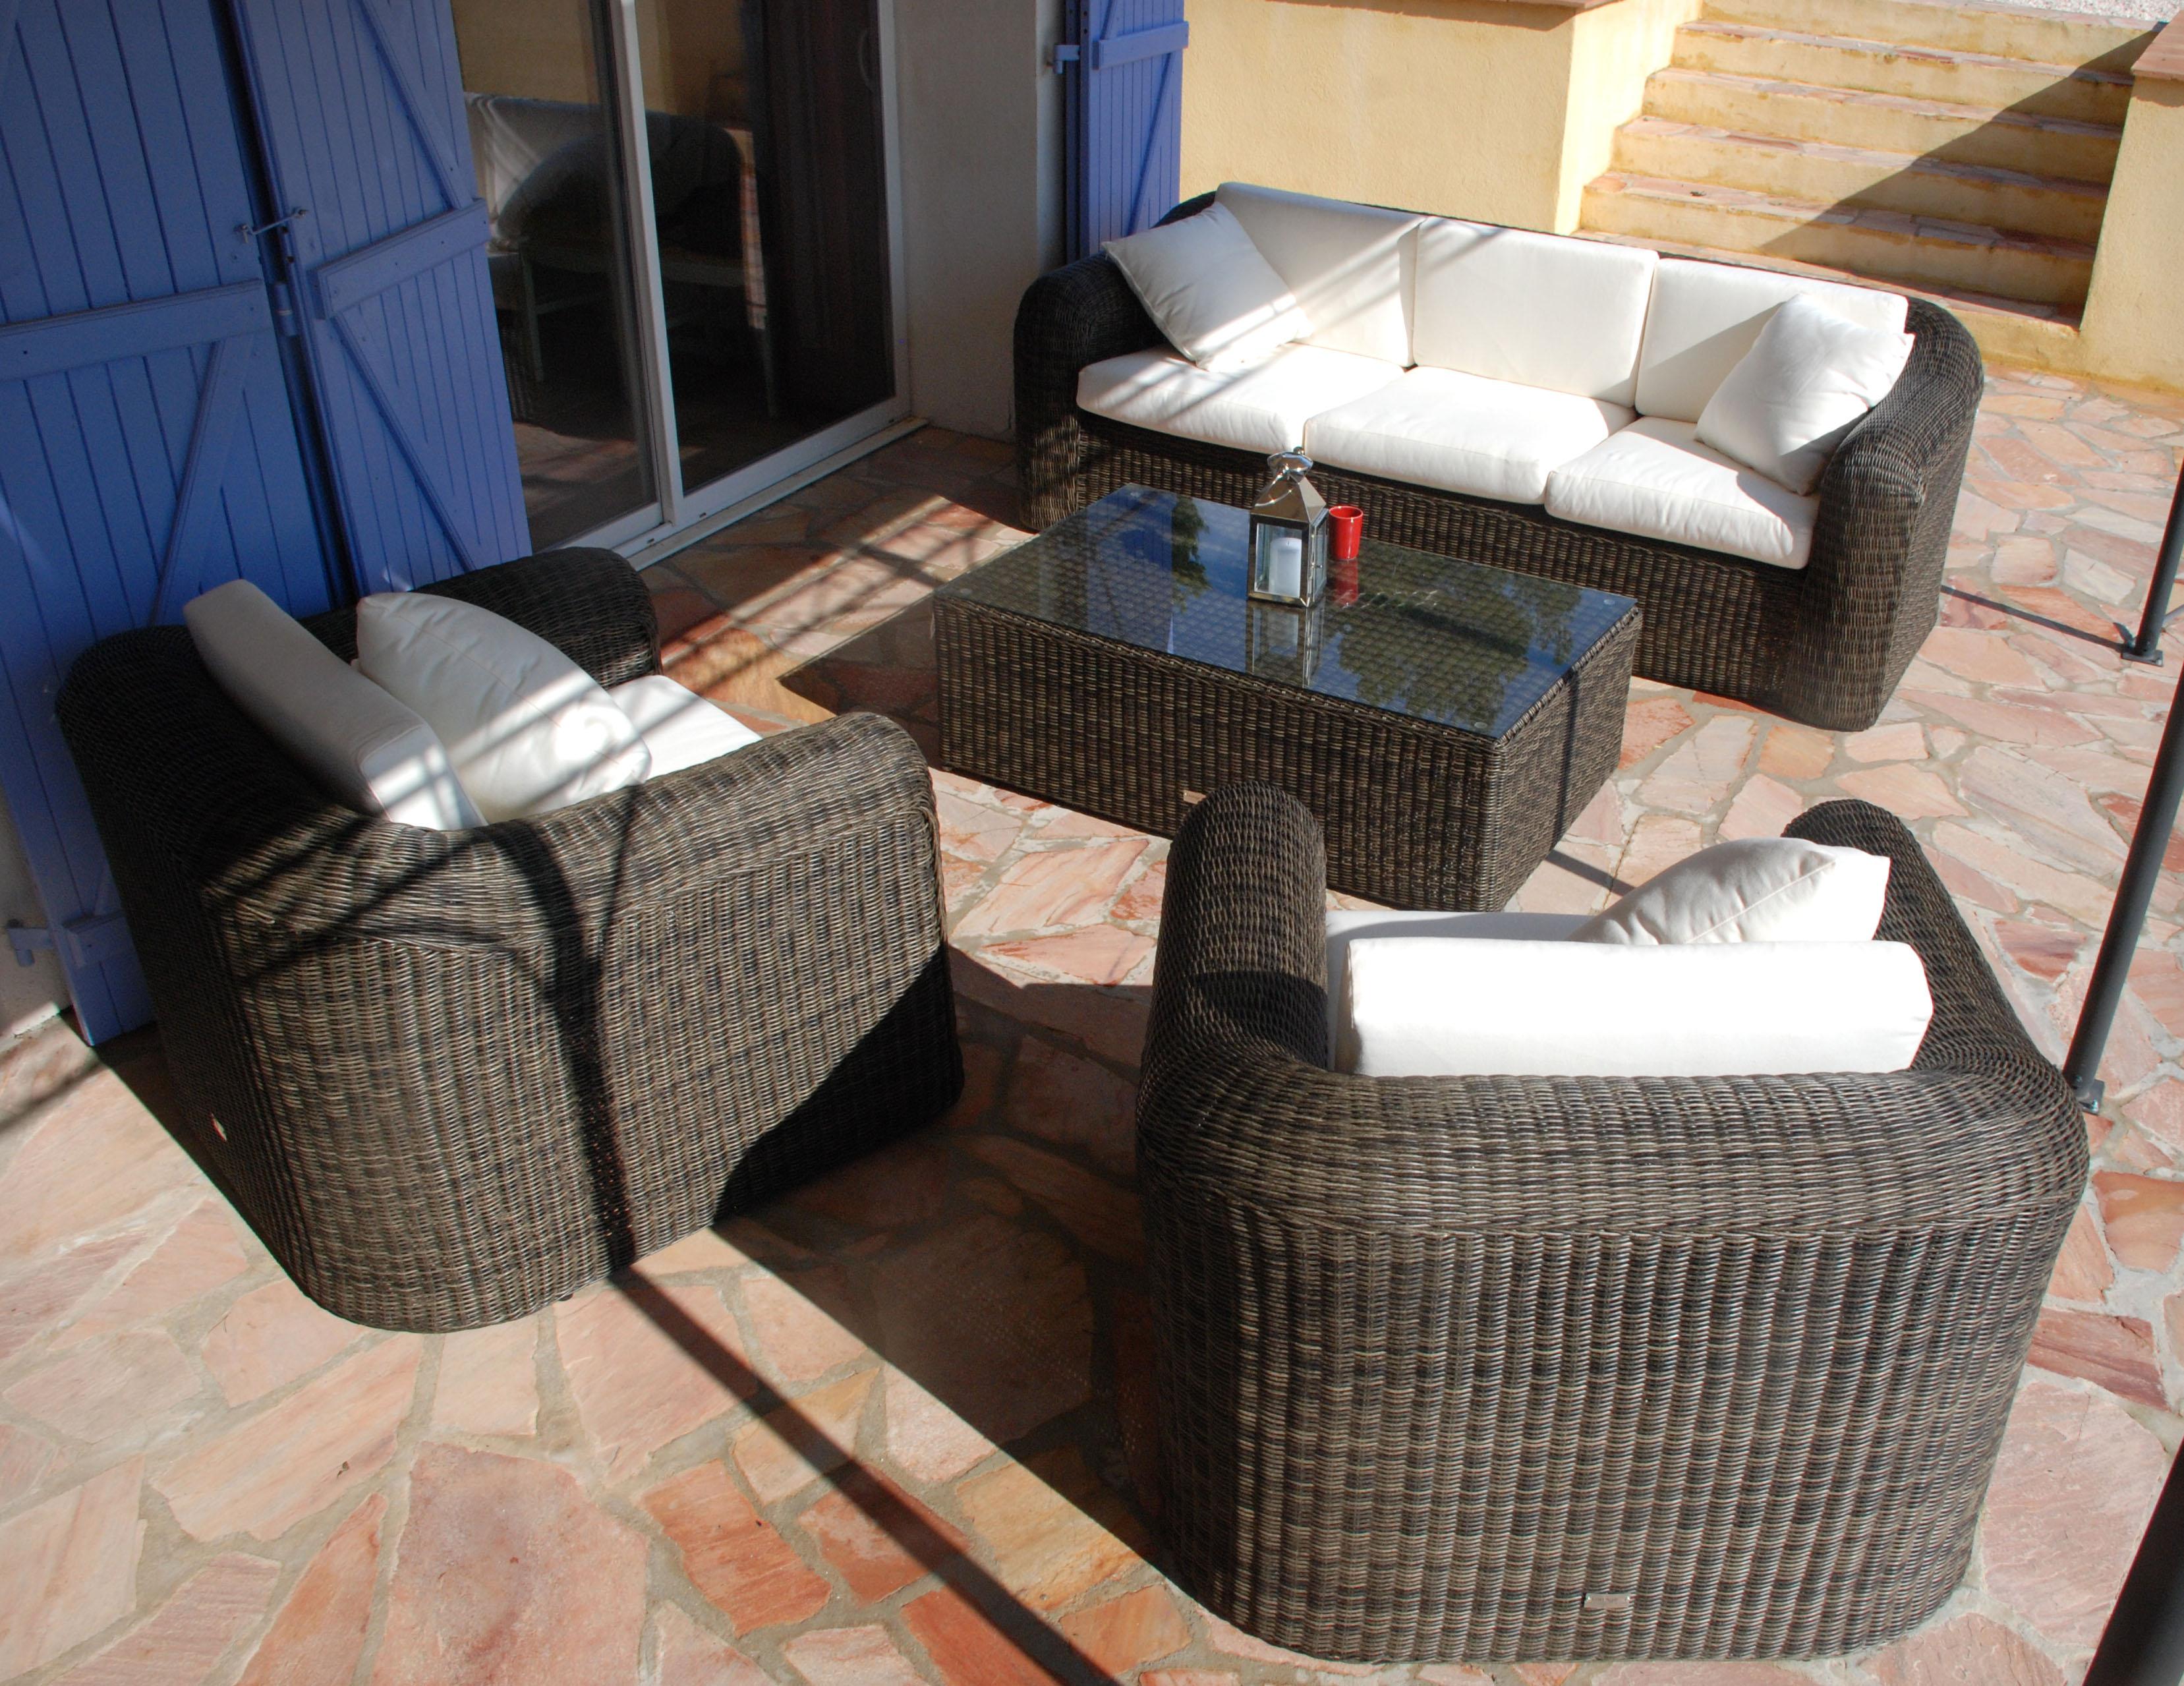 Salon de jardin resine ikea - Jardin piscine et Cabane